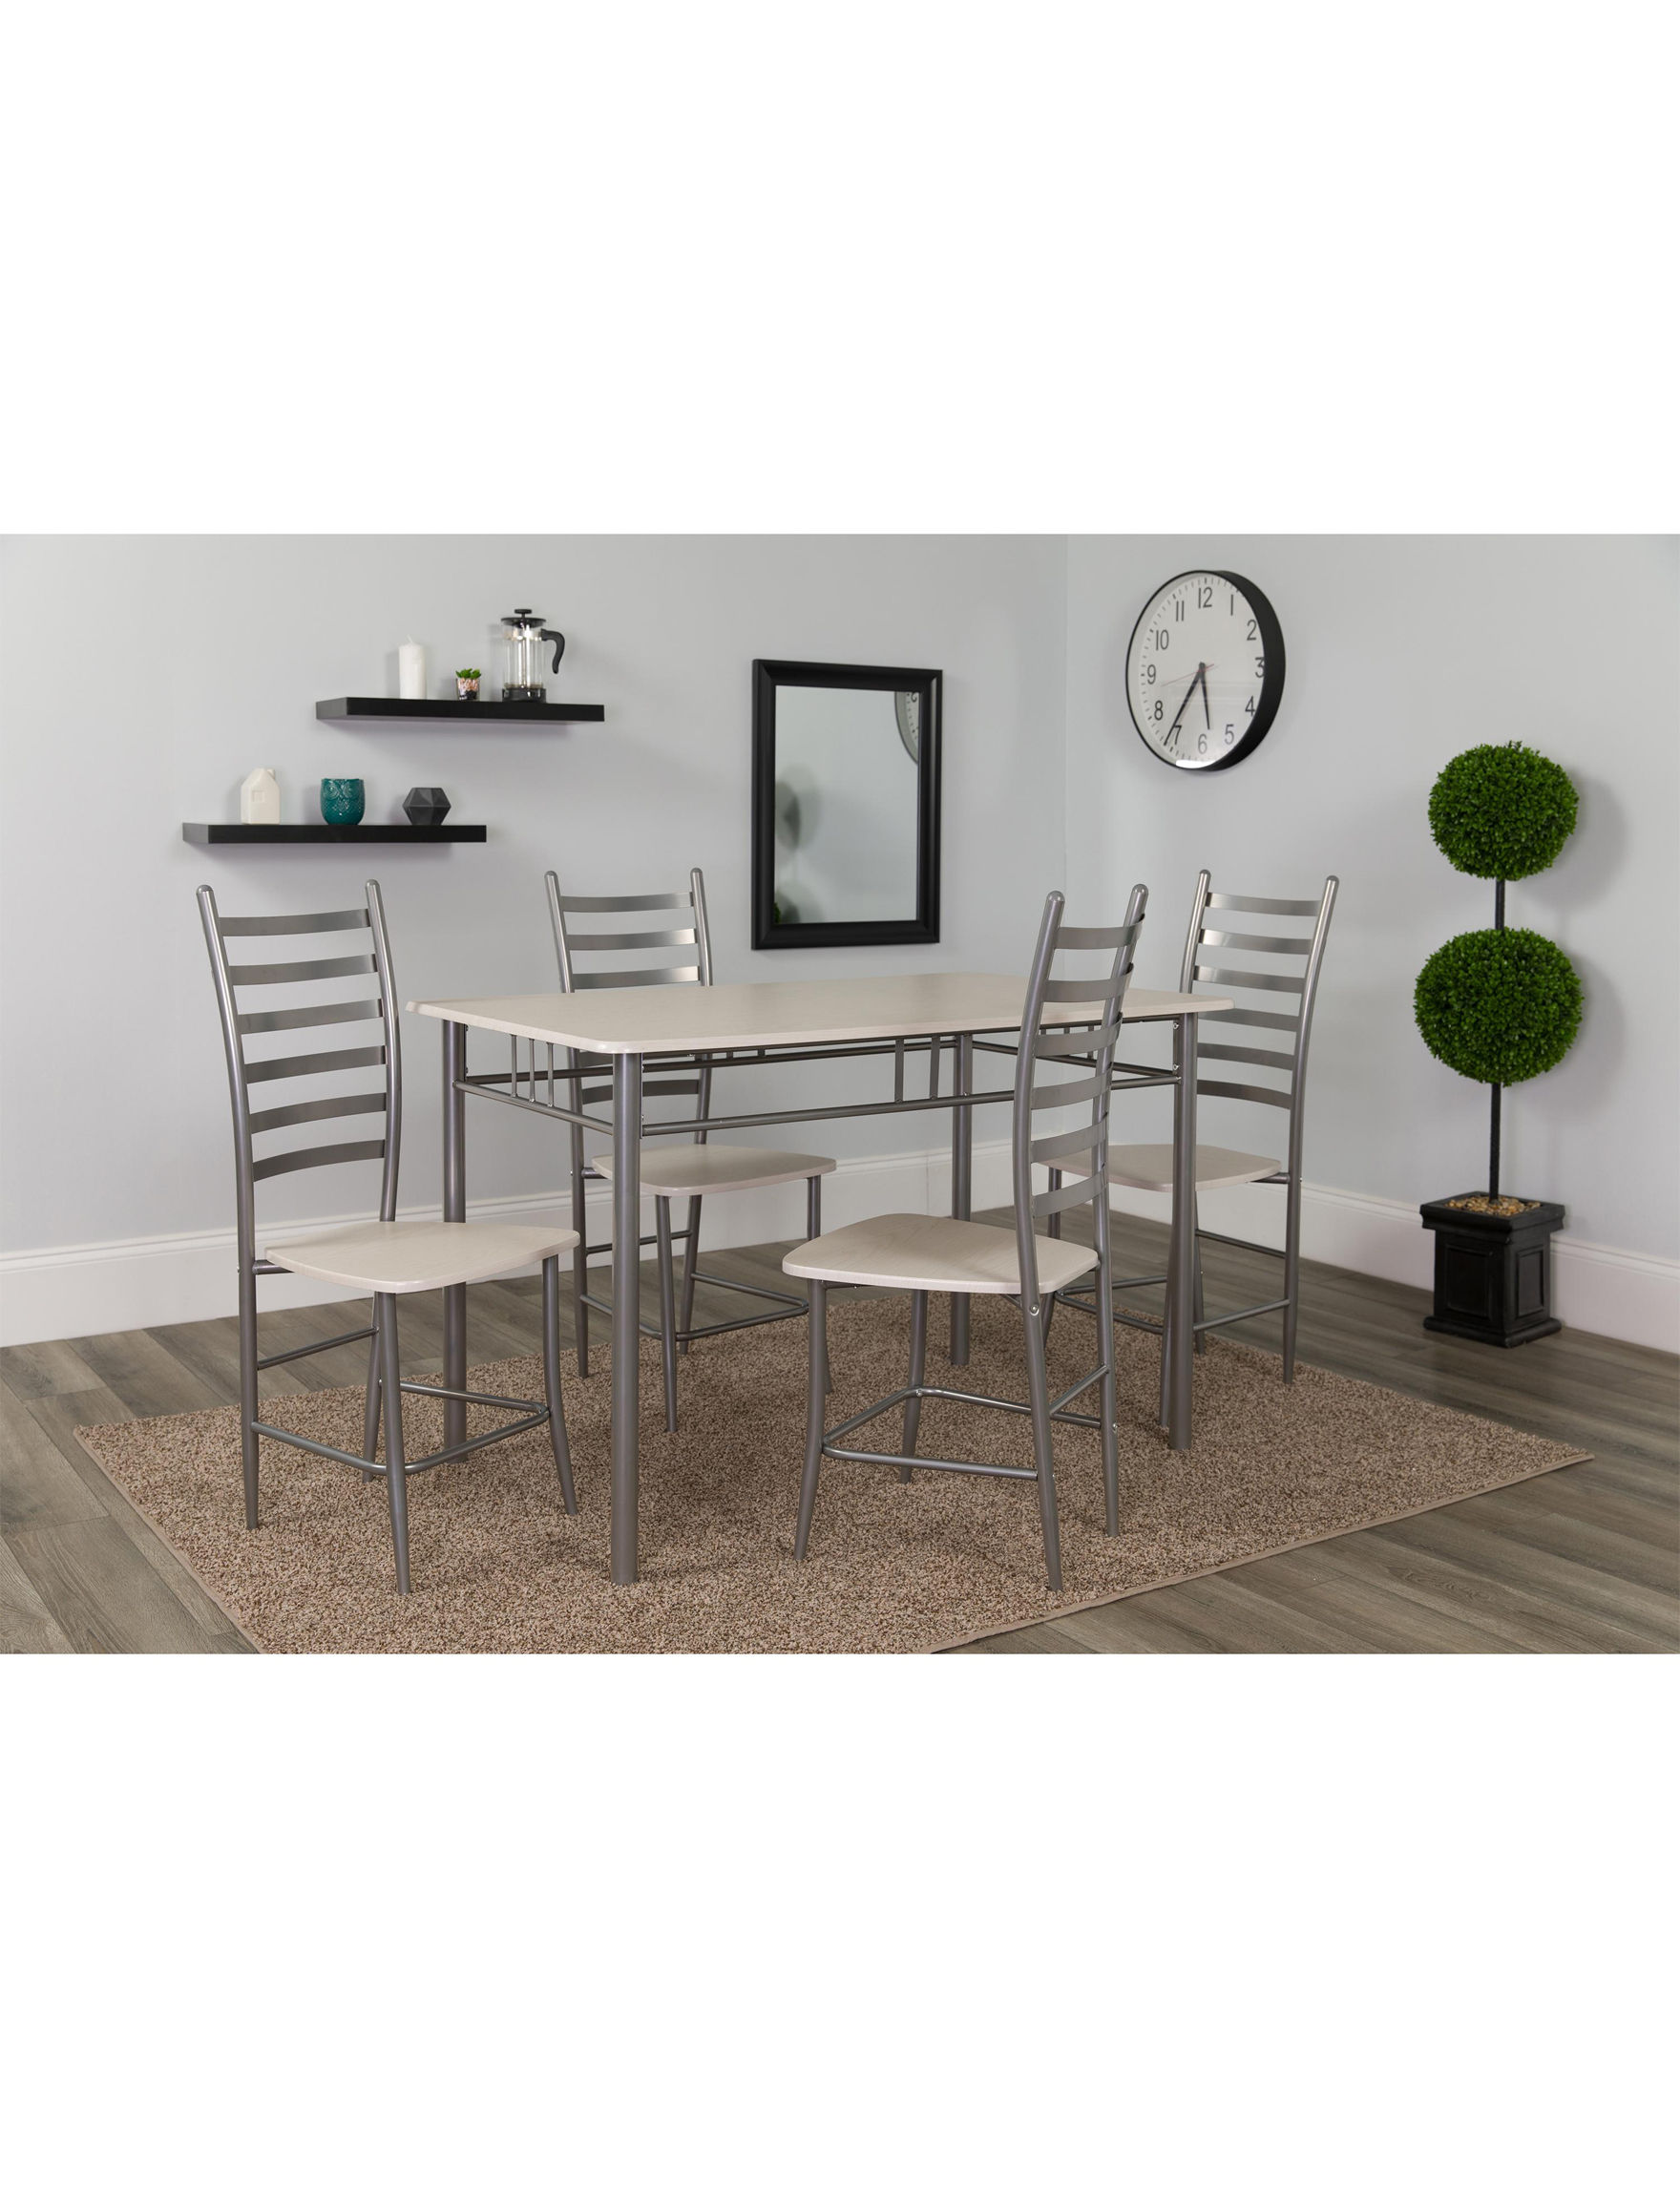 Flash Furniture Grey / White Dining Room Sets Kitchen & Dining Furniture